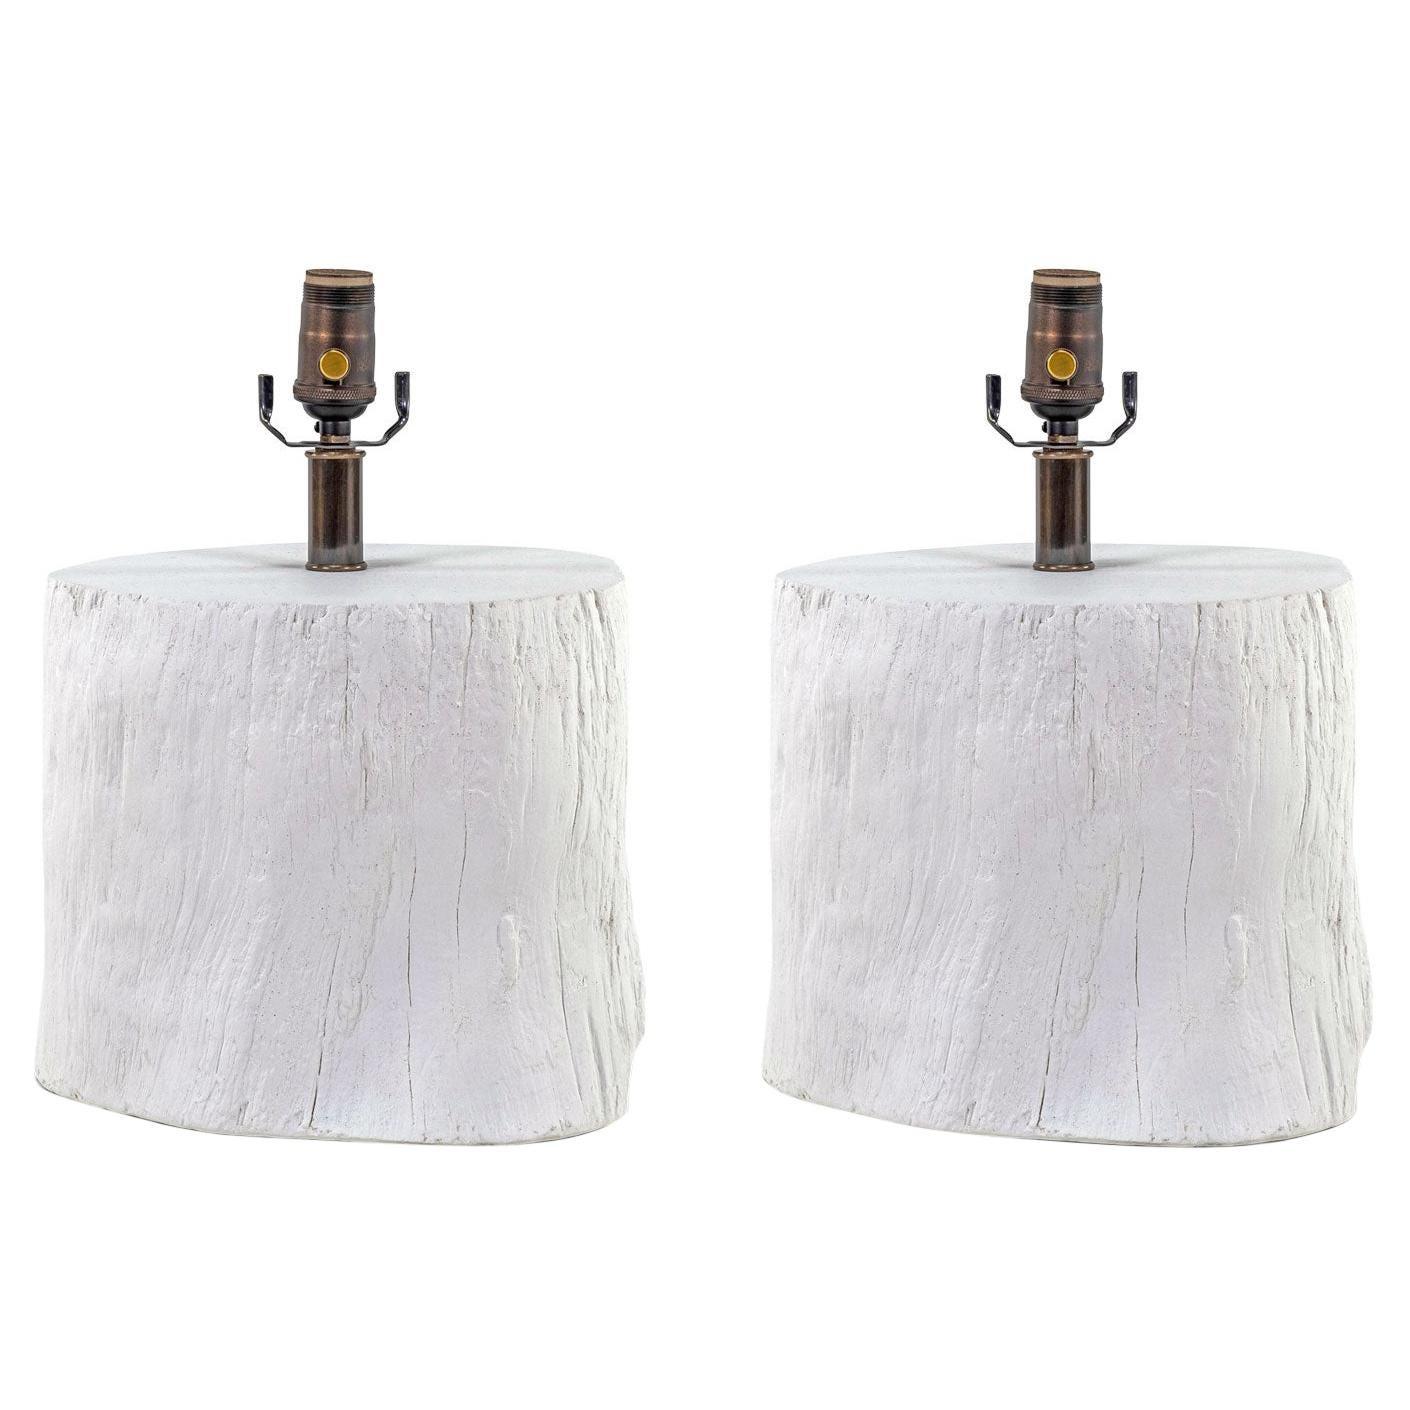 Faux Bois 'Tree Stump' White Plaster Lamp